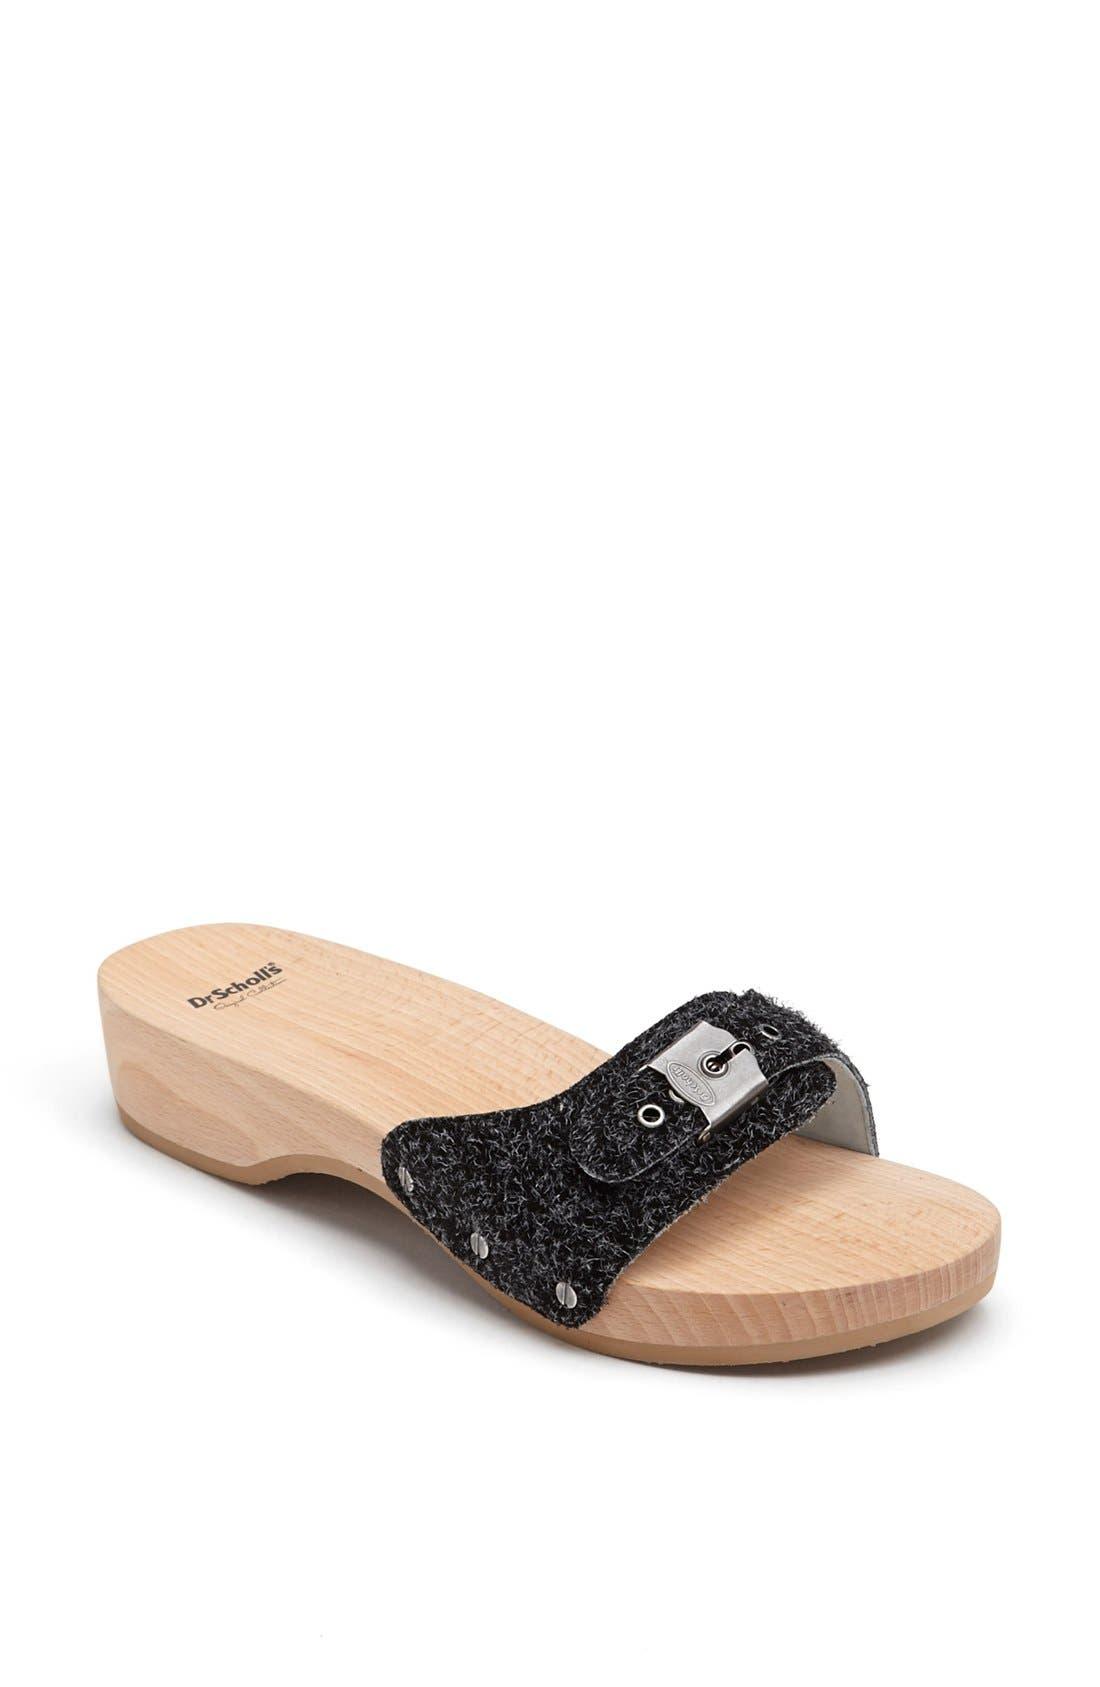 Main Image - Dr. Scholl's 'Original' Sandal